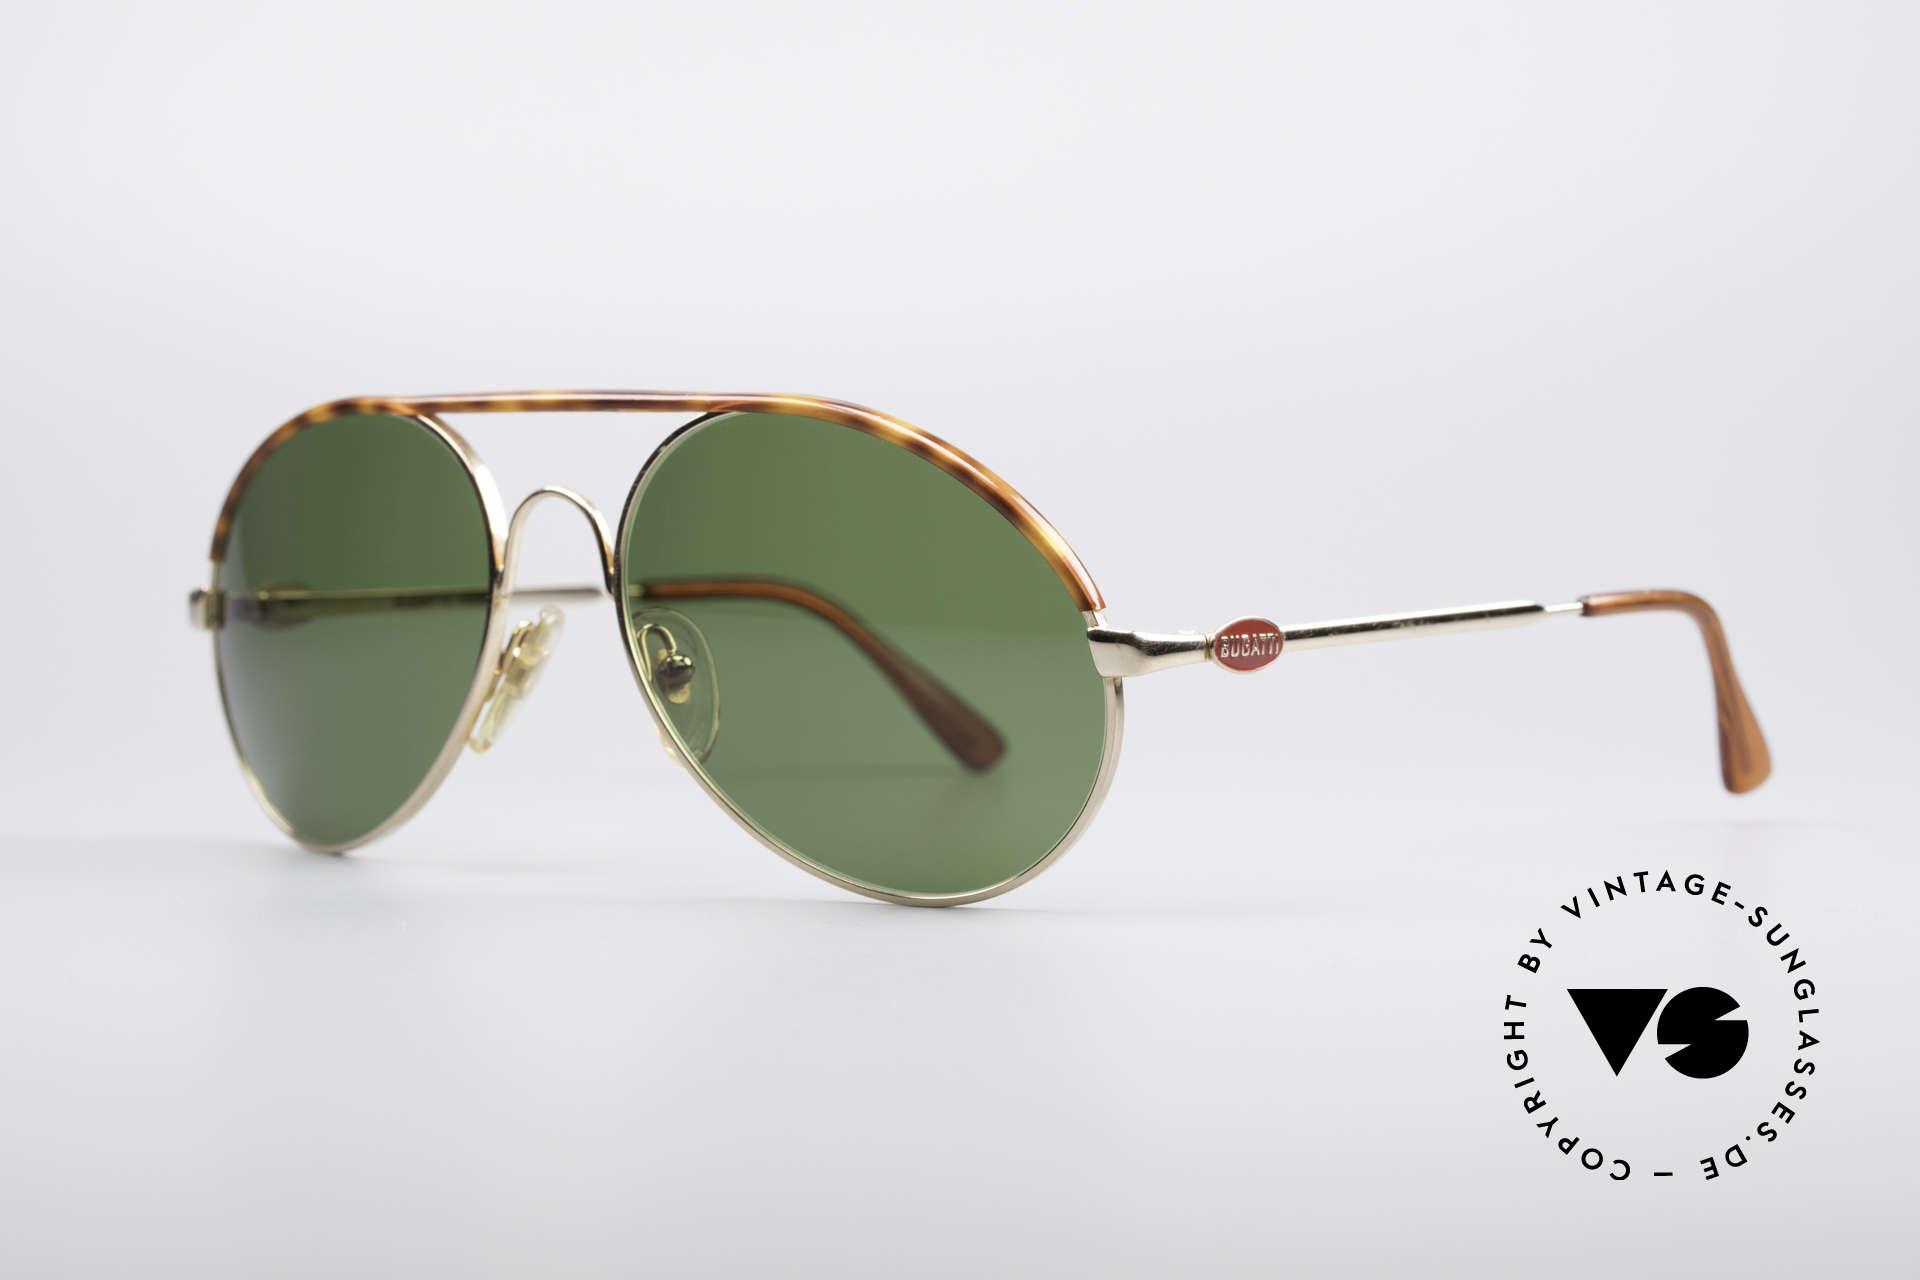 Bugatti 65986 Men's 80's Sunglasses, basic mod. 65986 refined with tortoise appliqué, Made for Men